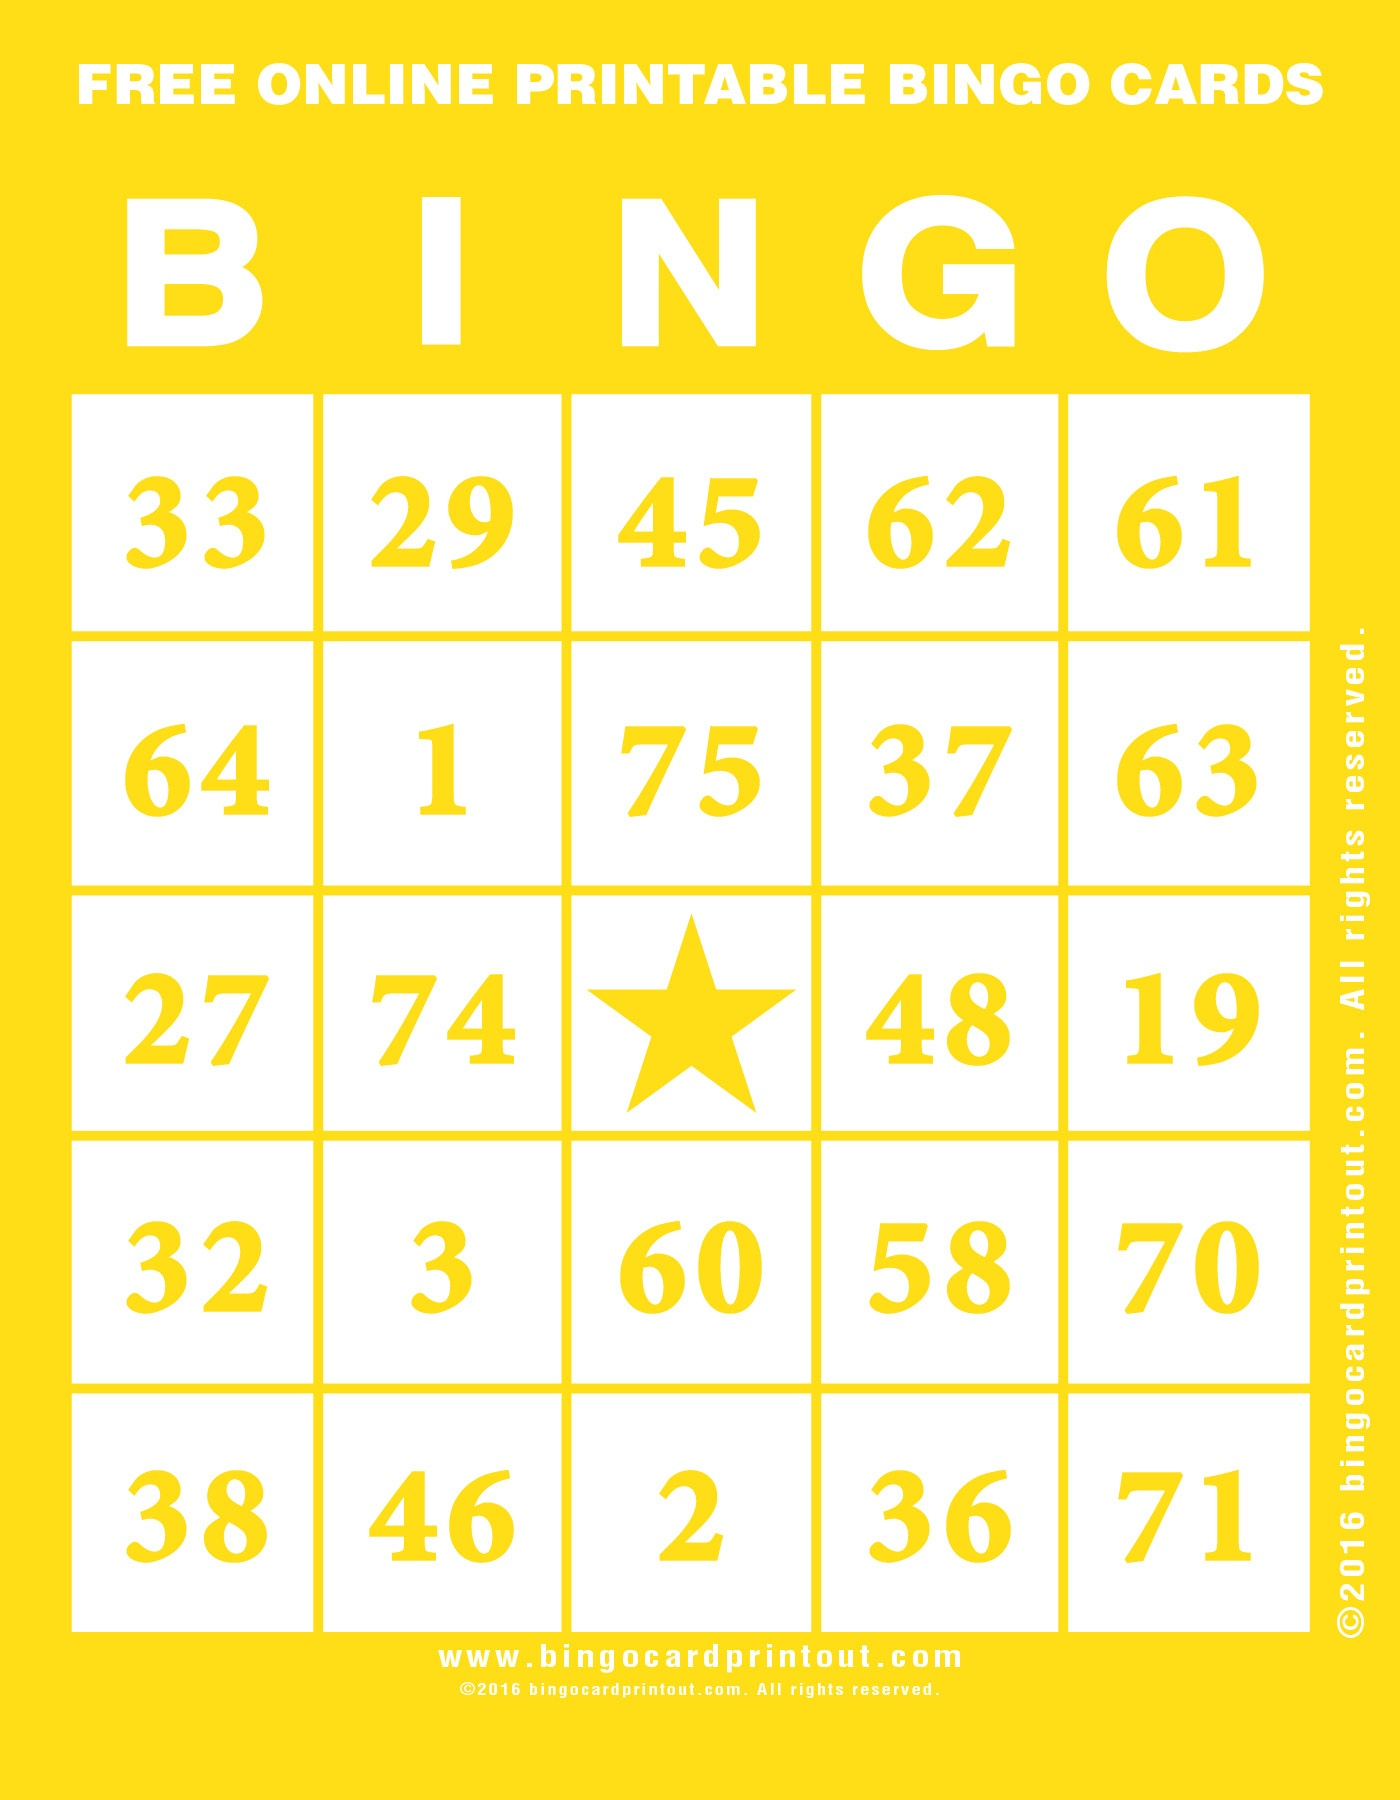 Free Online Printable Bingo Cards - Bingocardprintout - Free Printable Bingo Cards Random Numbers